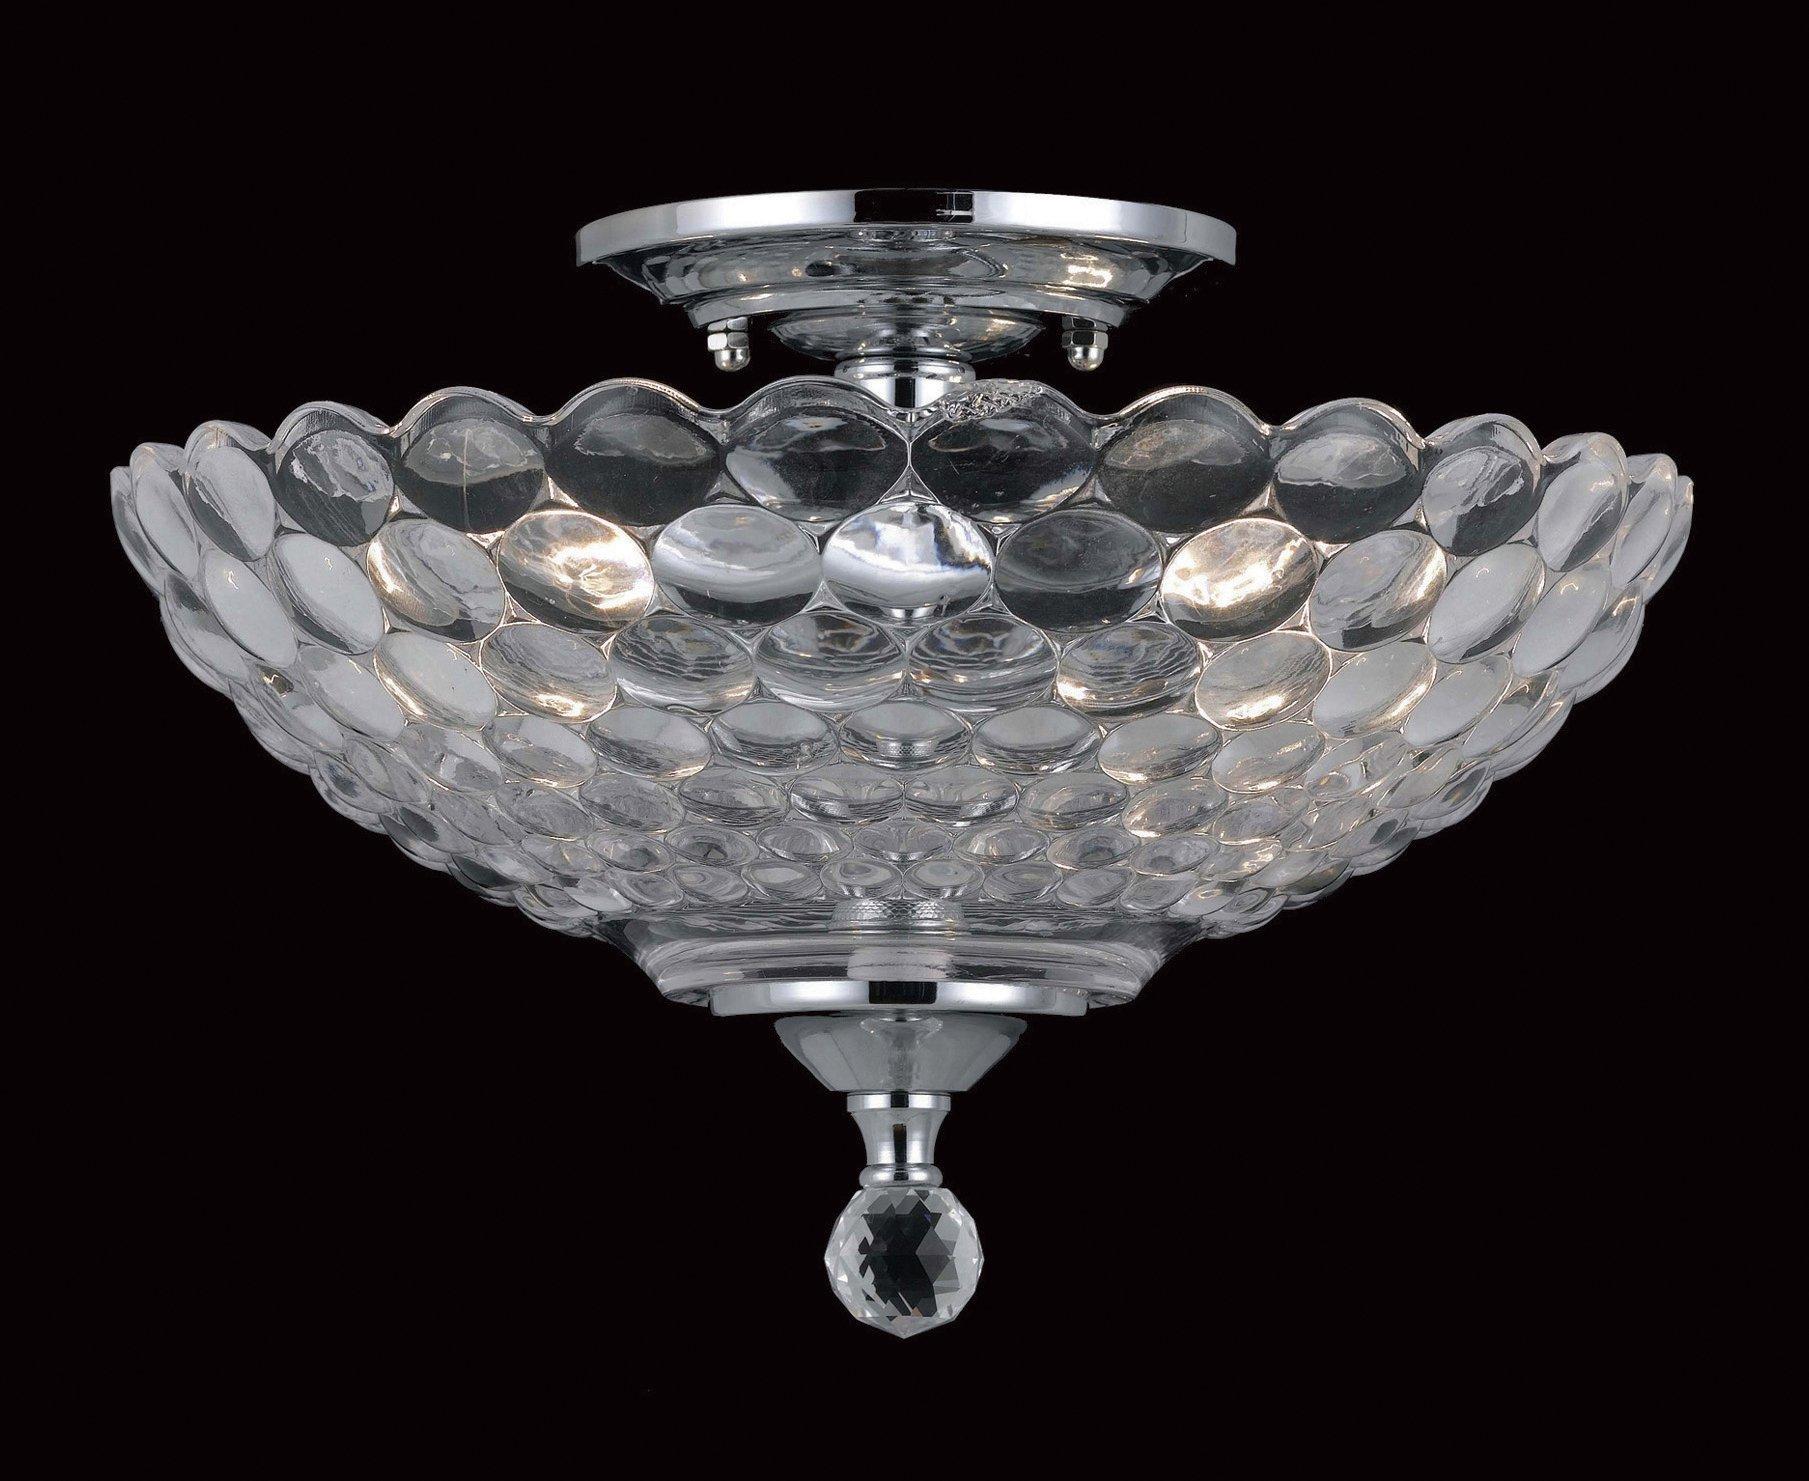 dallas glass 2 bulb semi flush light fitting review. Black Bedroom Furniture Sets. Home Design Ideas